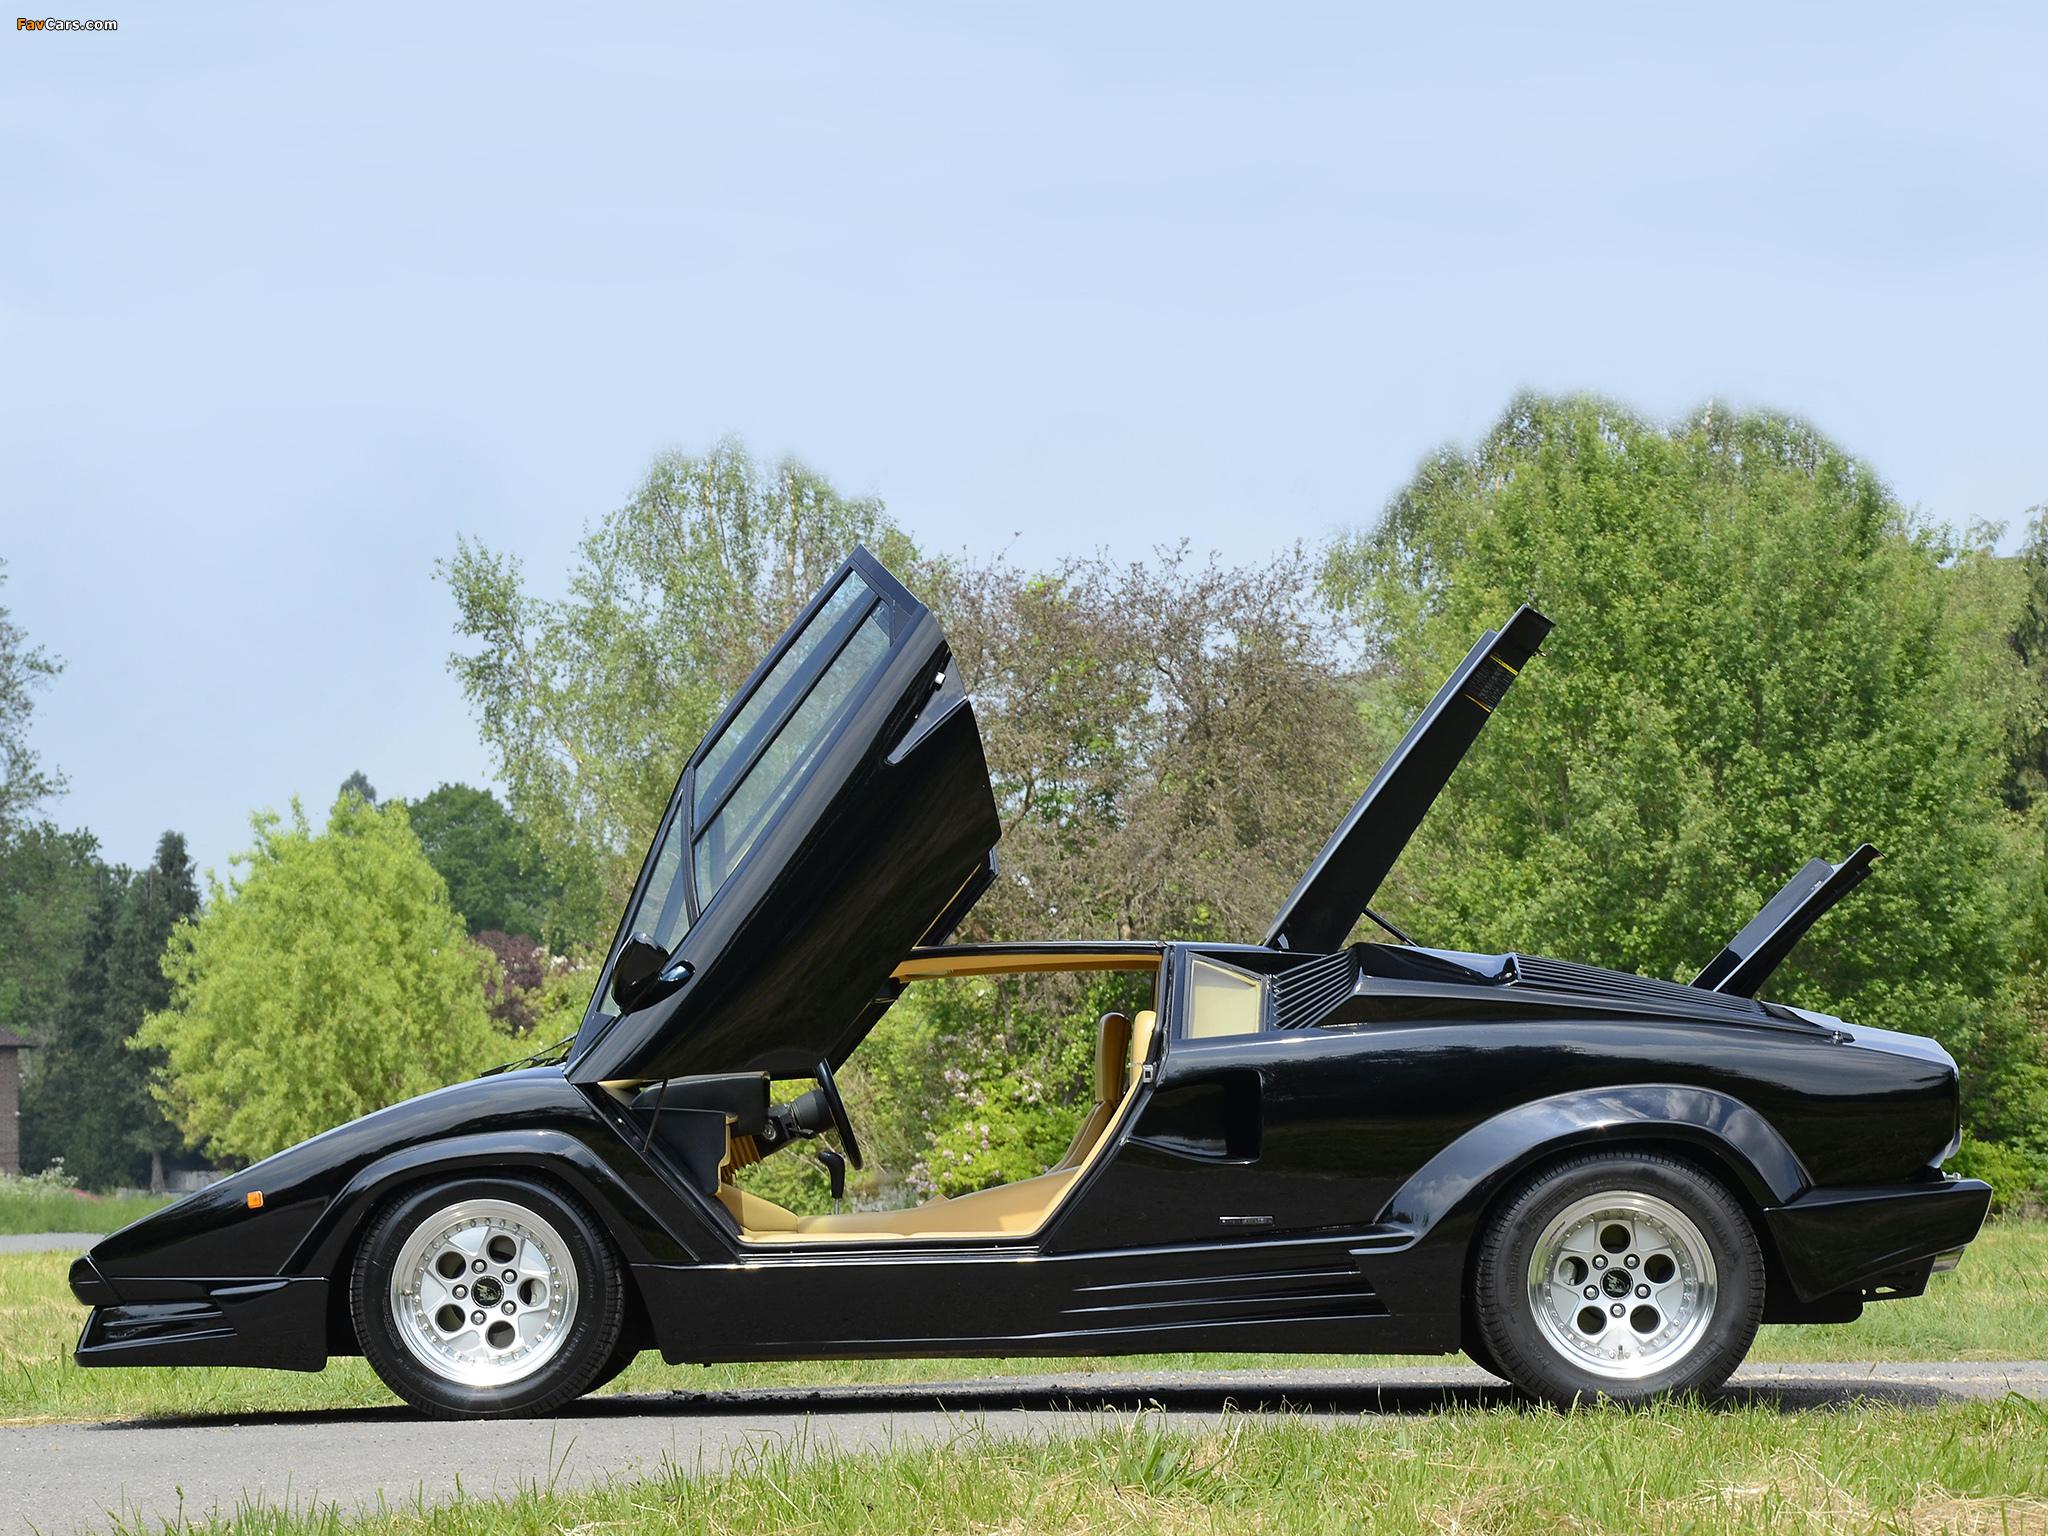 lamborghini_countach_1988_photos_9 Elegant Lamborghini Countach 25th Anniversary Specs Cars Trend